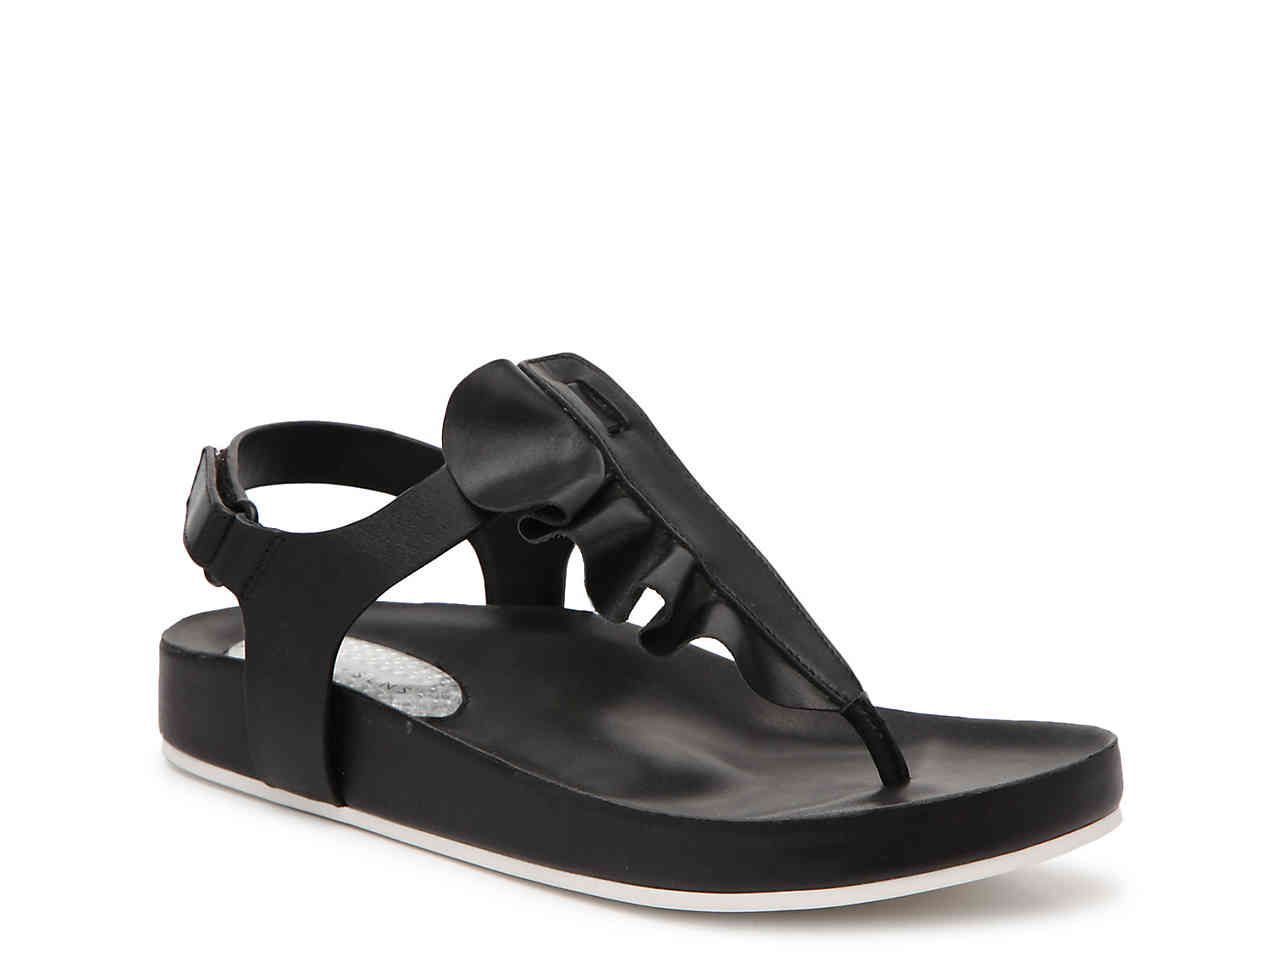 COM \u0026 SENS Albah Sandal | Sandals, Dsw